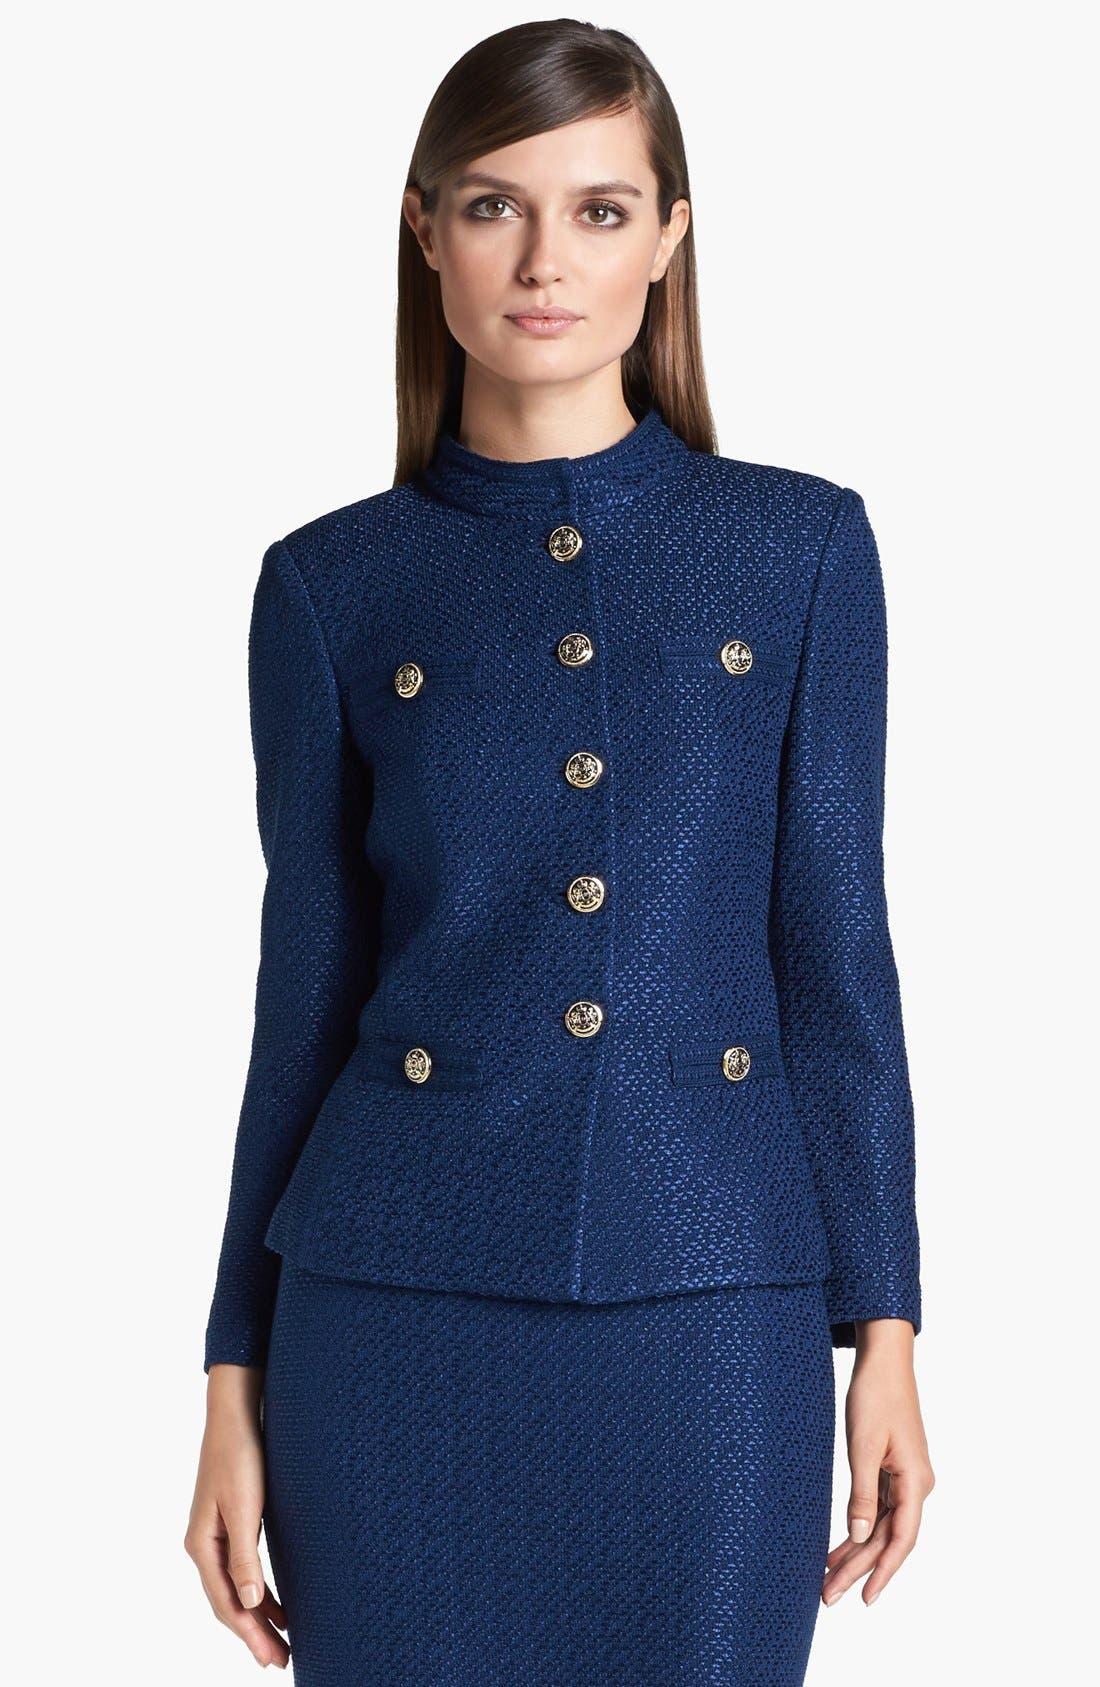 Main Image - St. John Collection Stand Collar Tonal Dot Knit Jacket